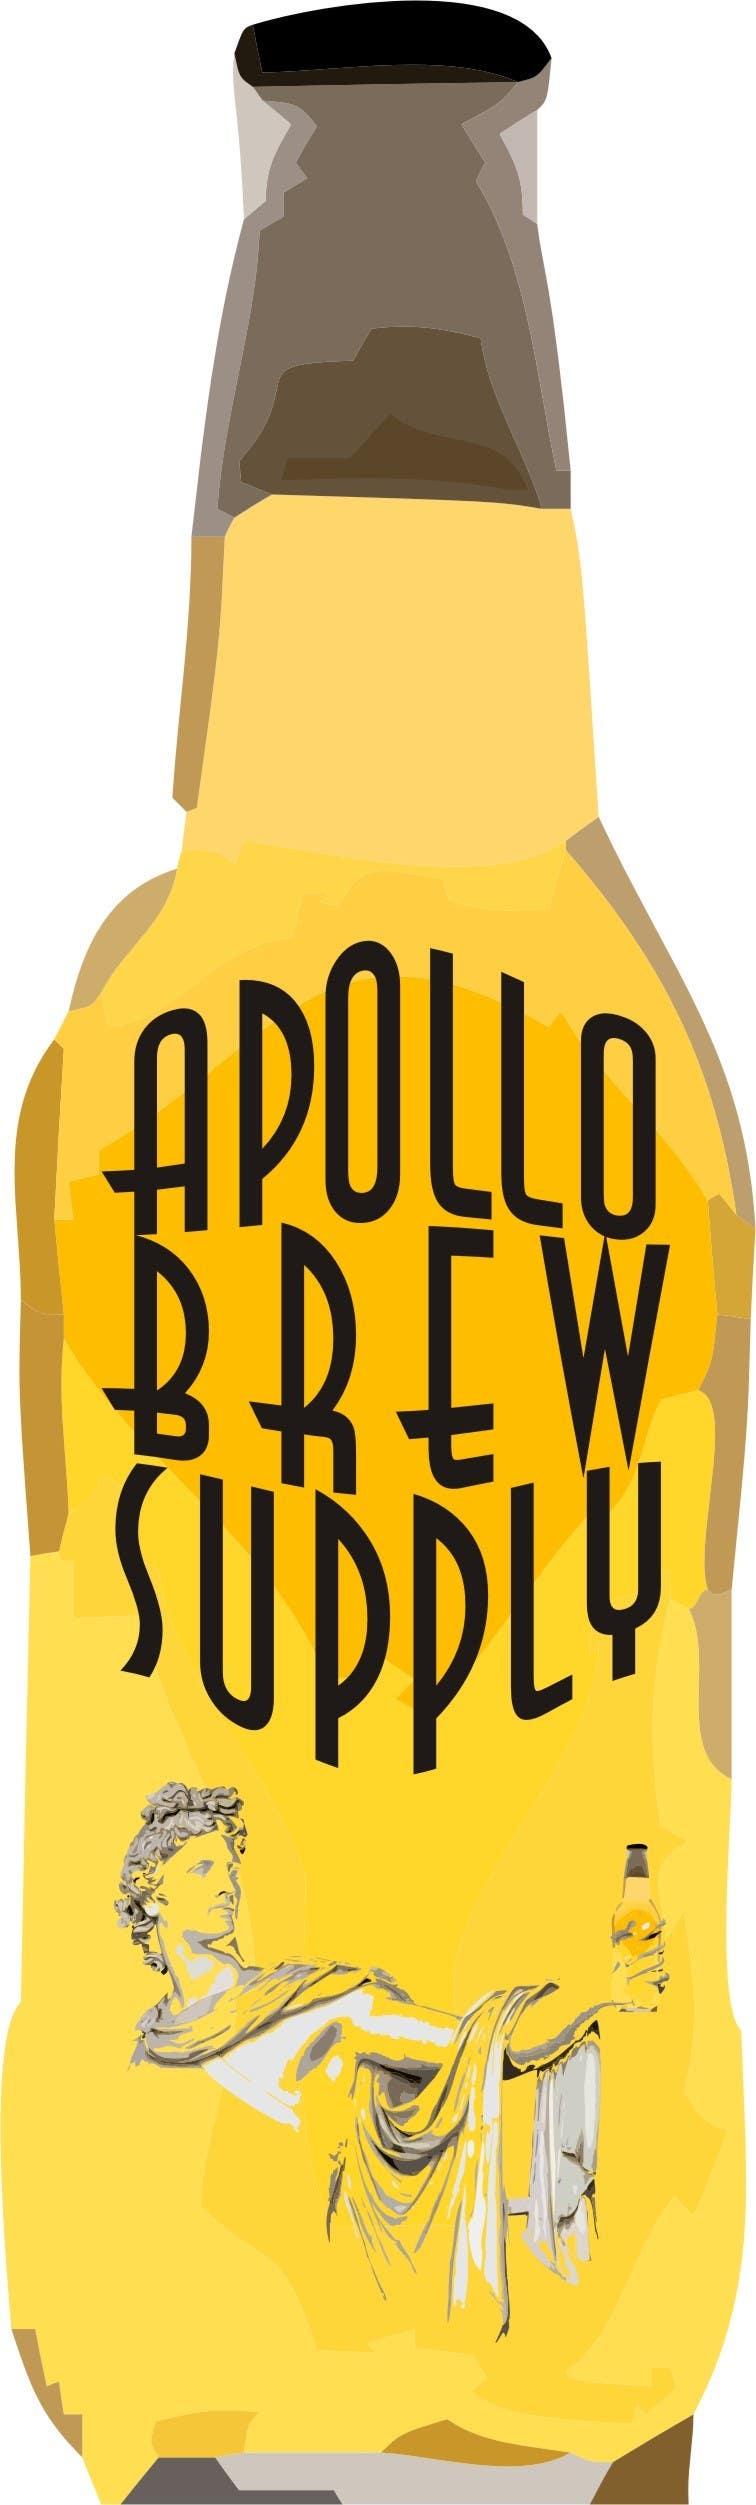 Bài tham dự cuộc thi #                                        13                                      cho                                         Design a Logo for a Beer/Brewing Company